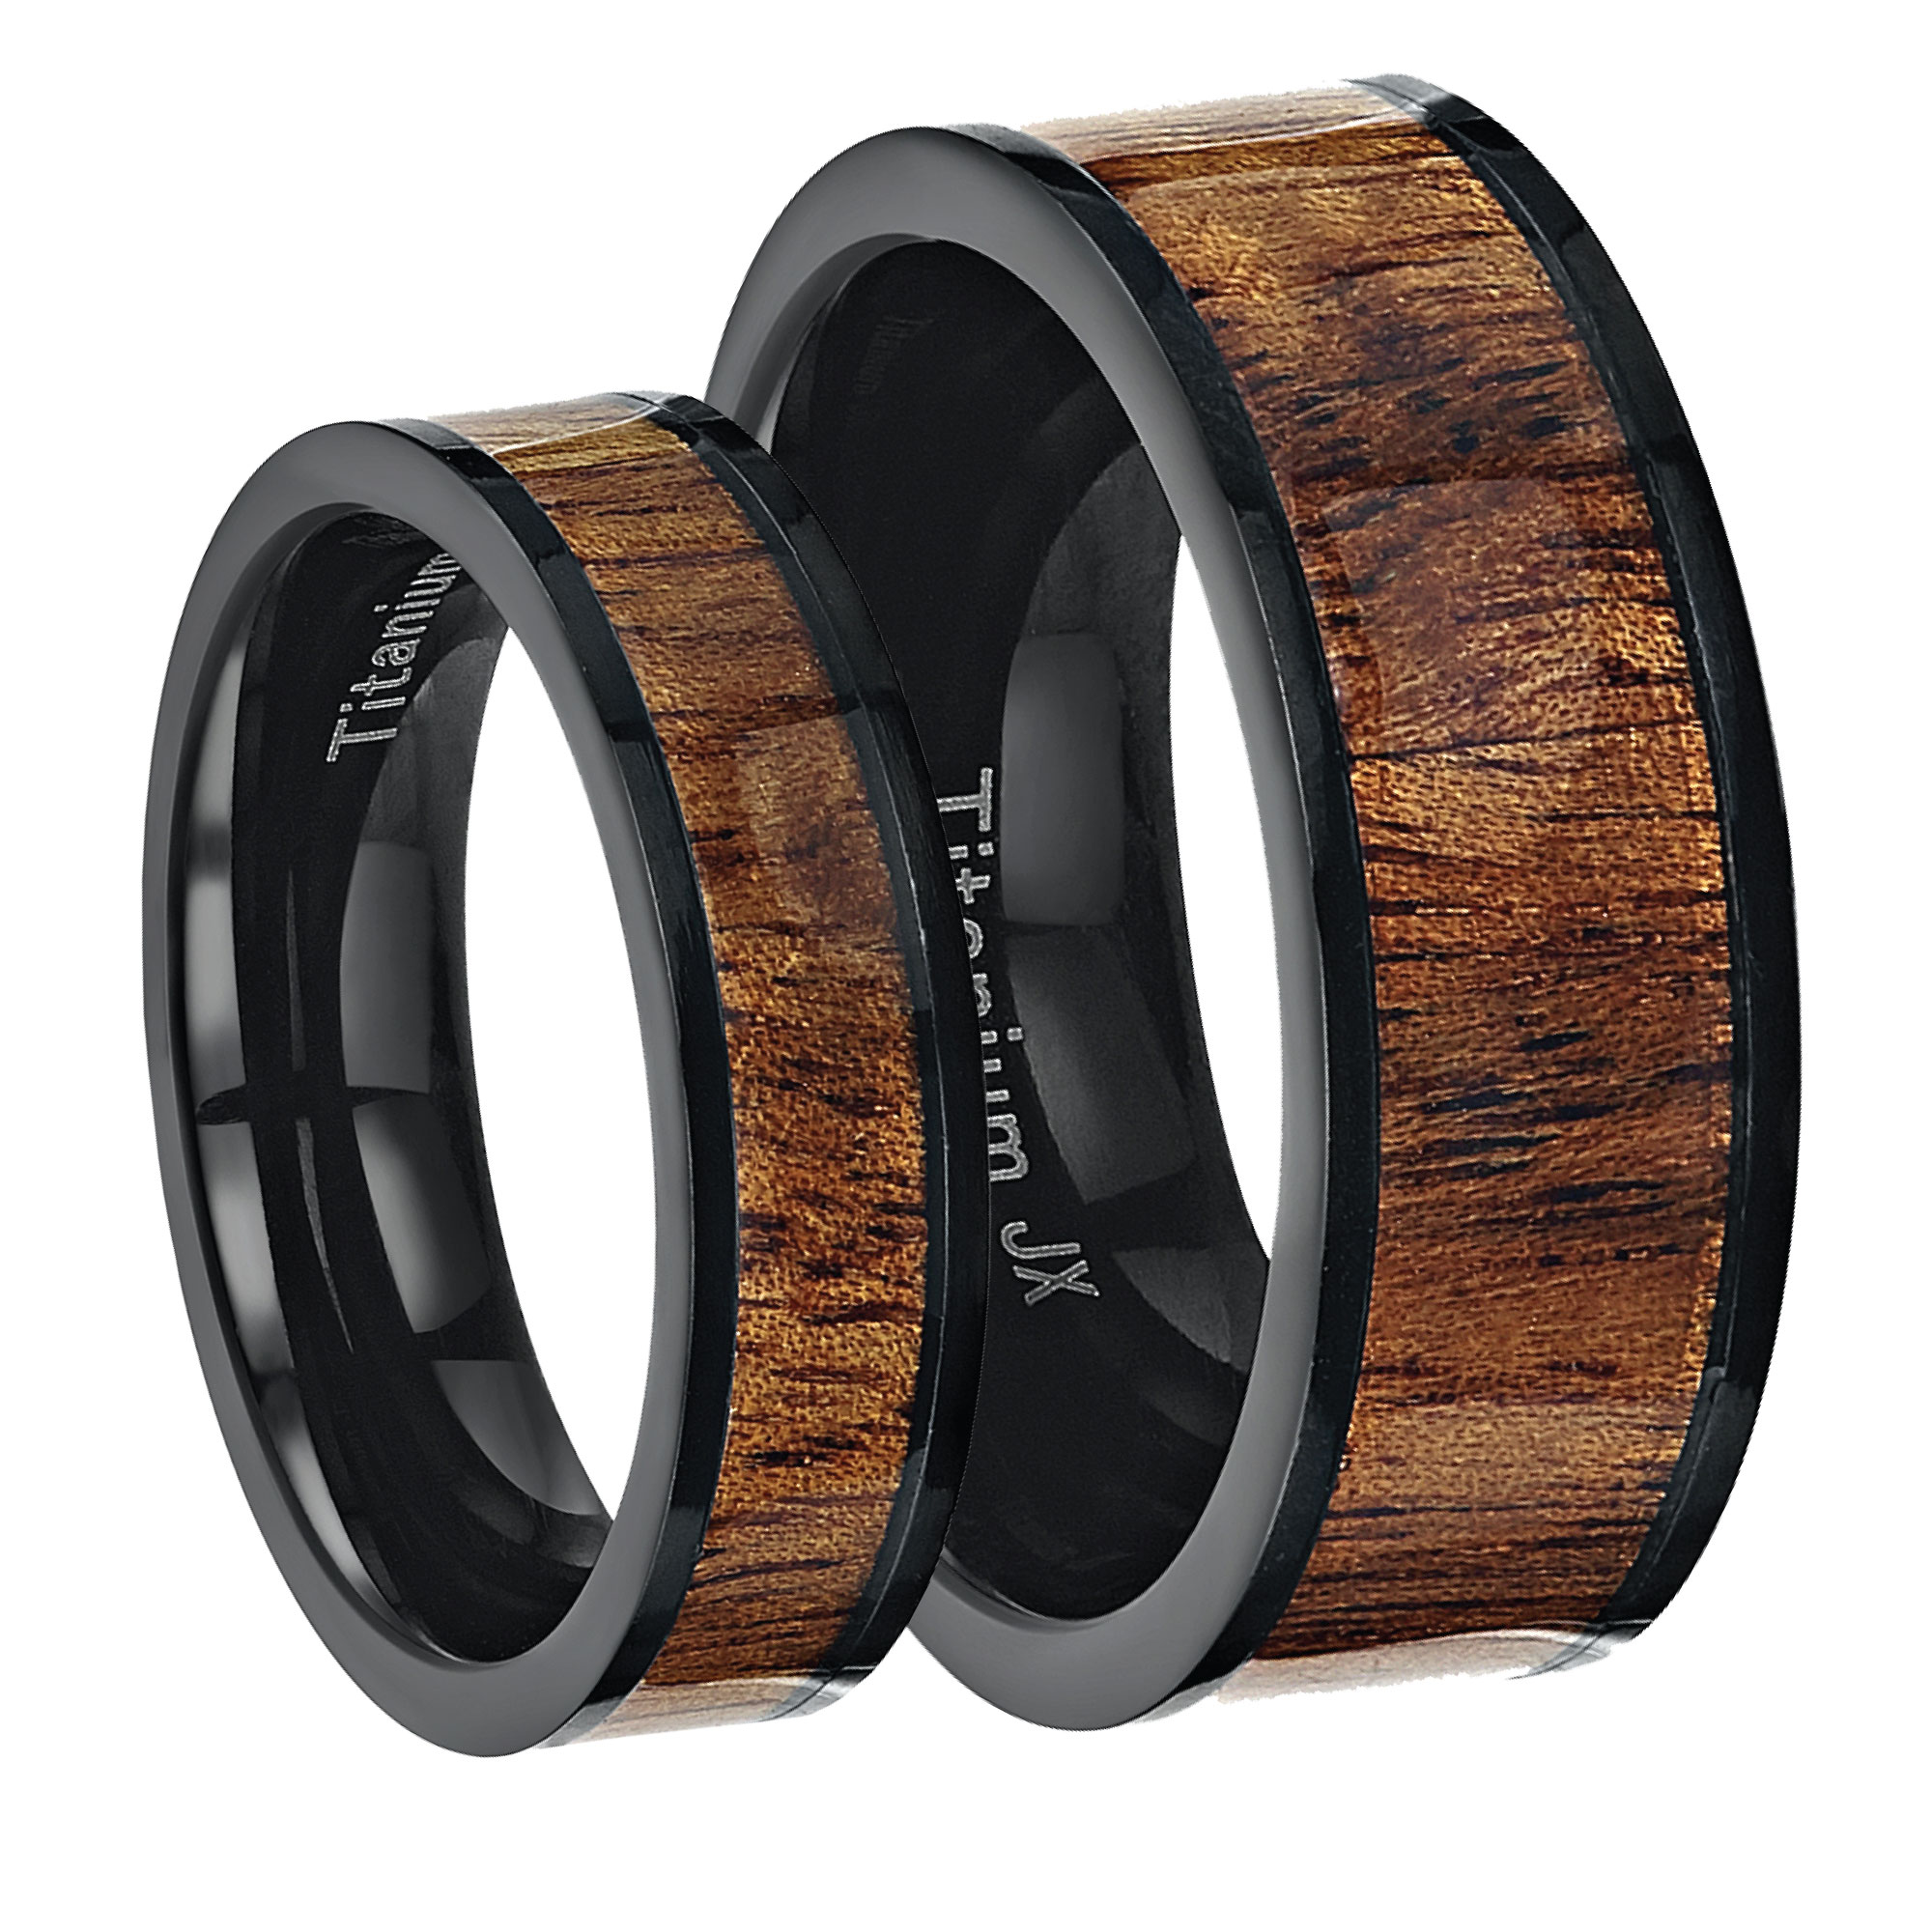 Matching Titanium Wedding Ring Sets His and Hers Titanium Diamond